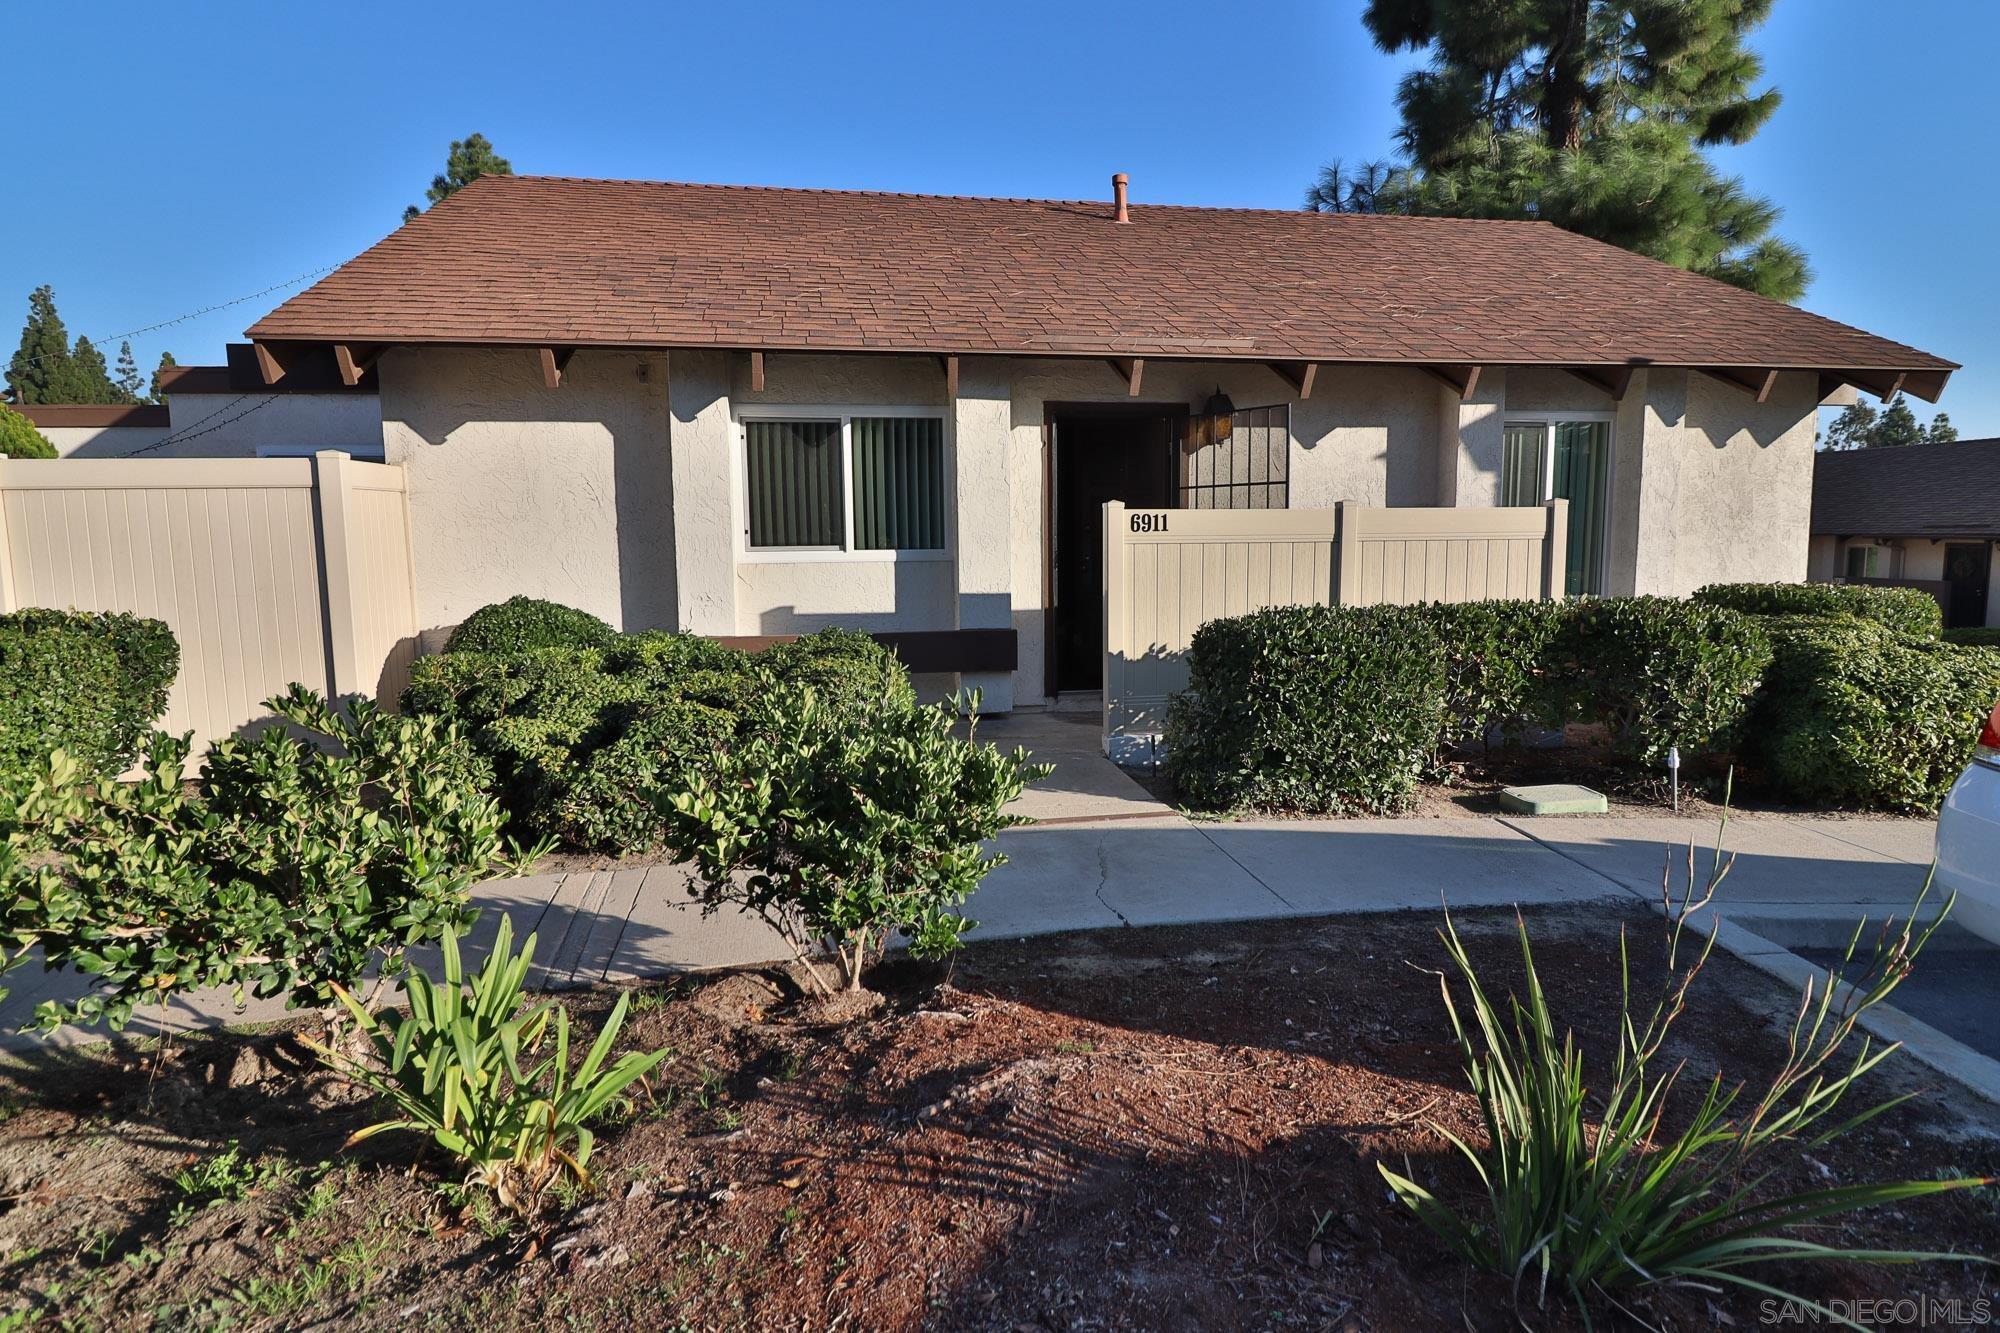 6911 Parkside, San Diego, CA 92139